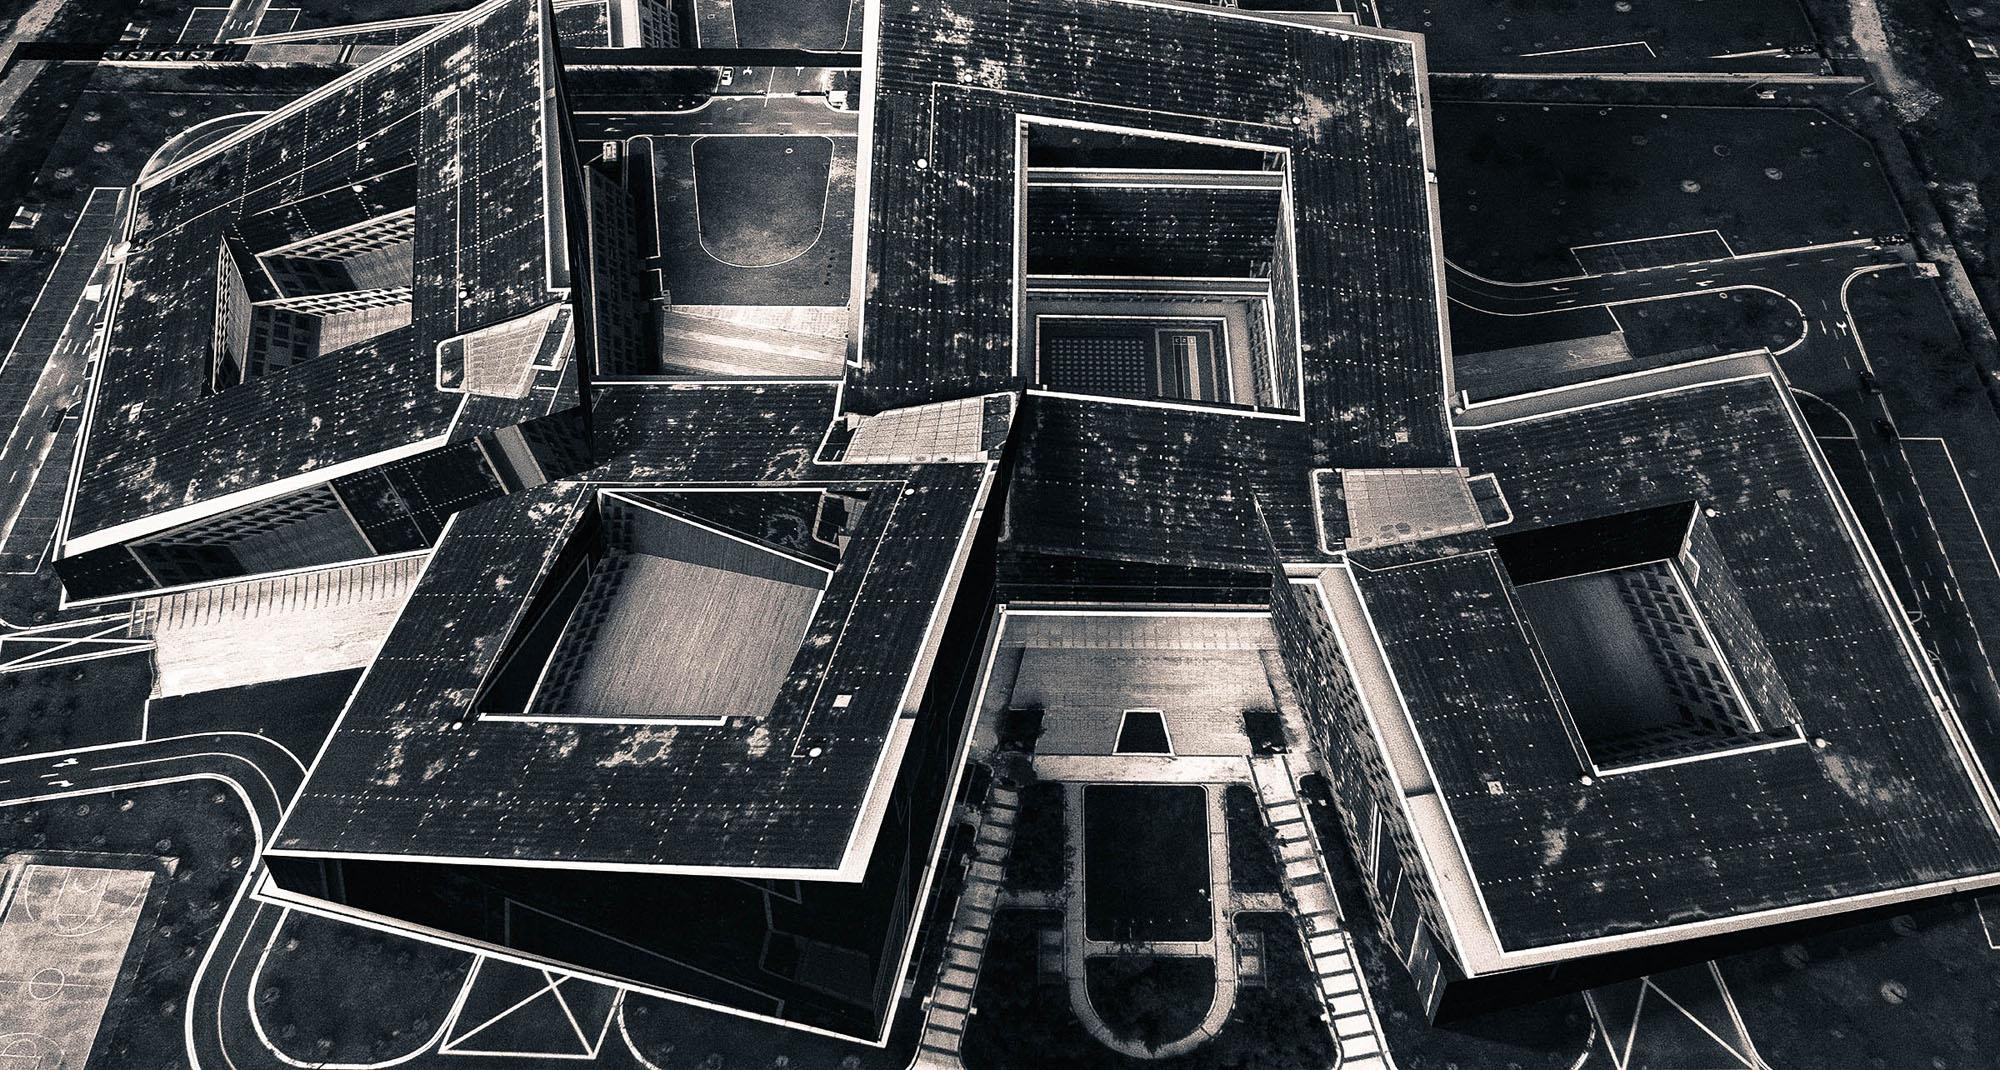 Architecture Photography Awards 1st place, dongni, china | world photography organisation